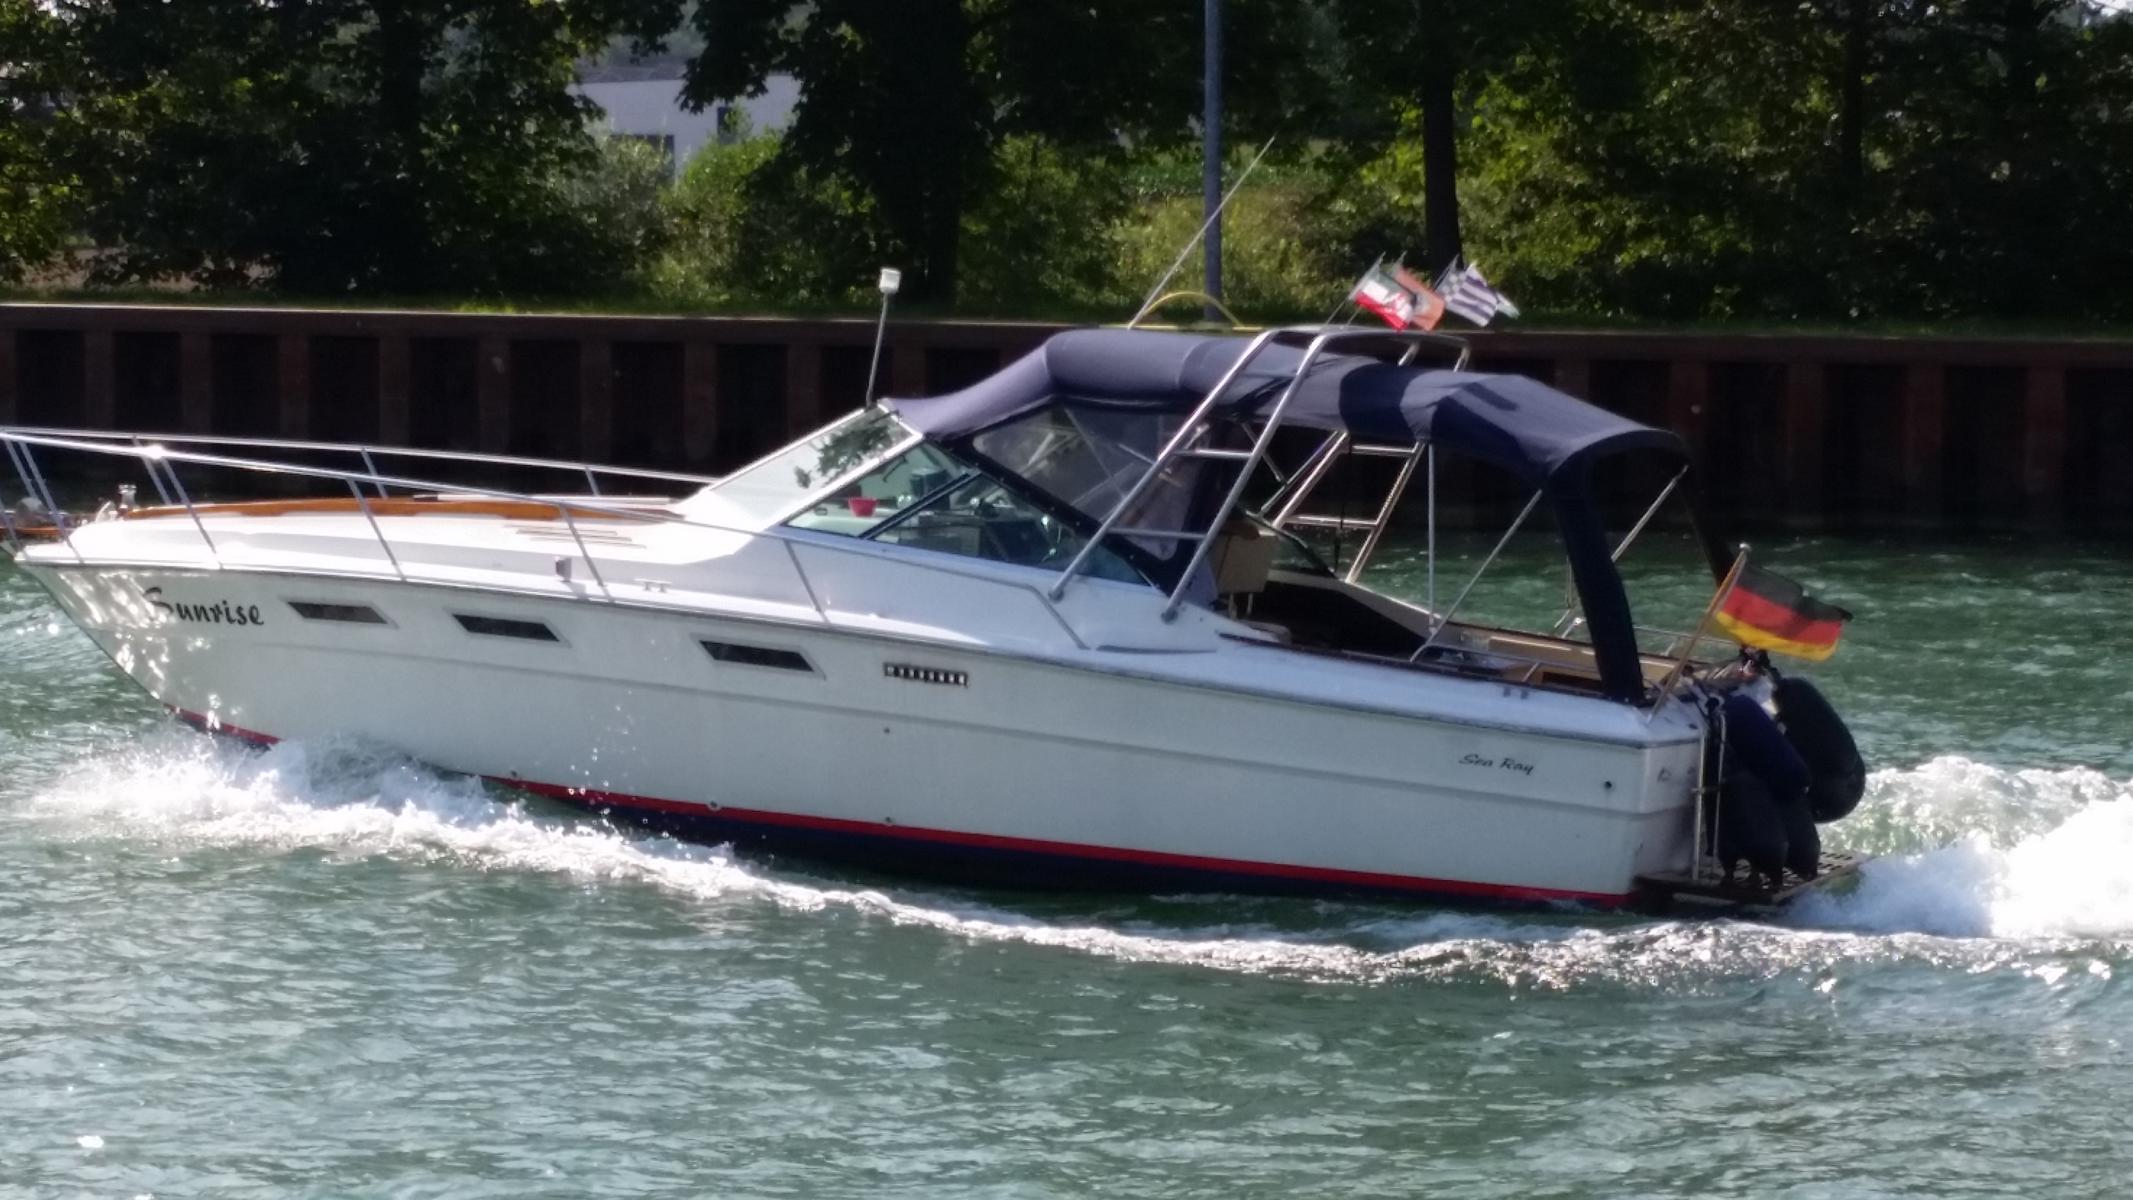 Ausflug auf dem Kanal - Monasteria Yachtclub Münster